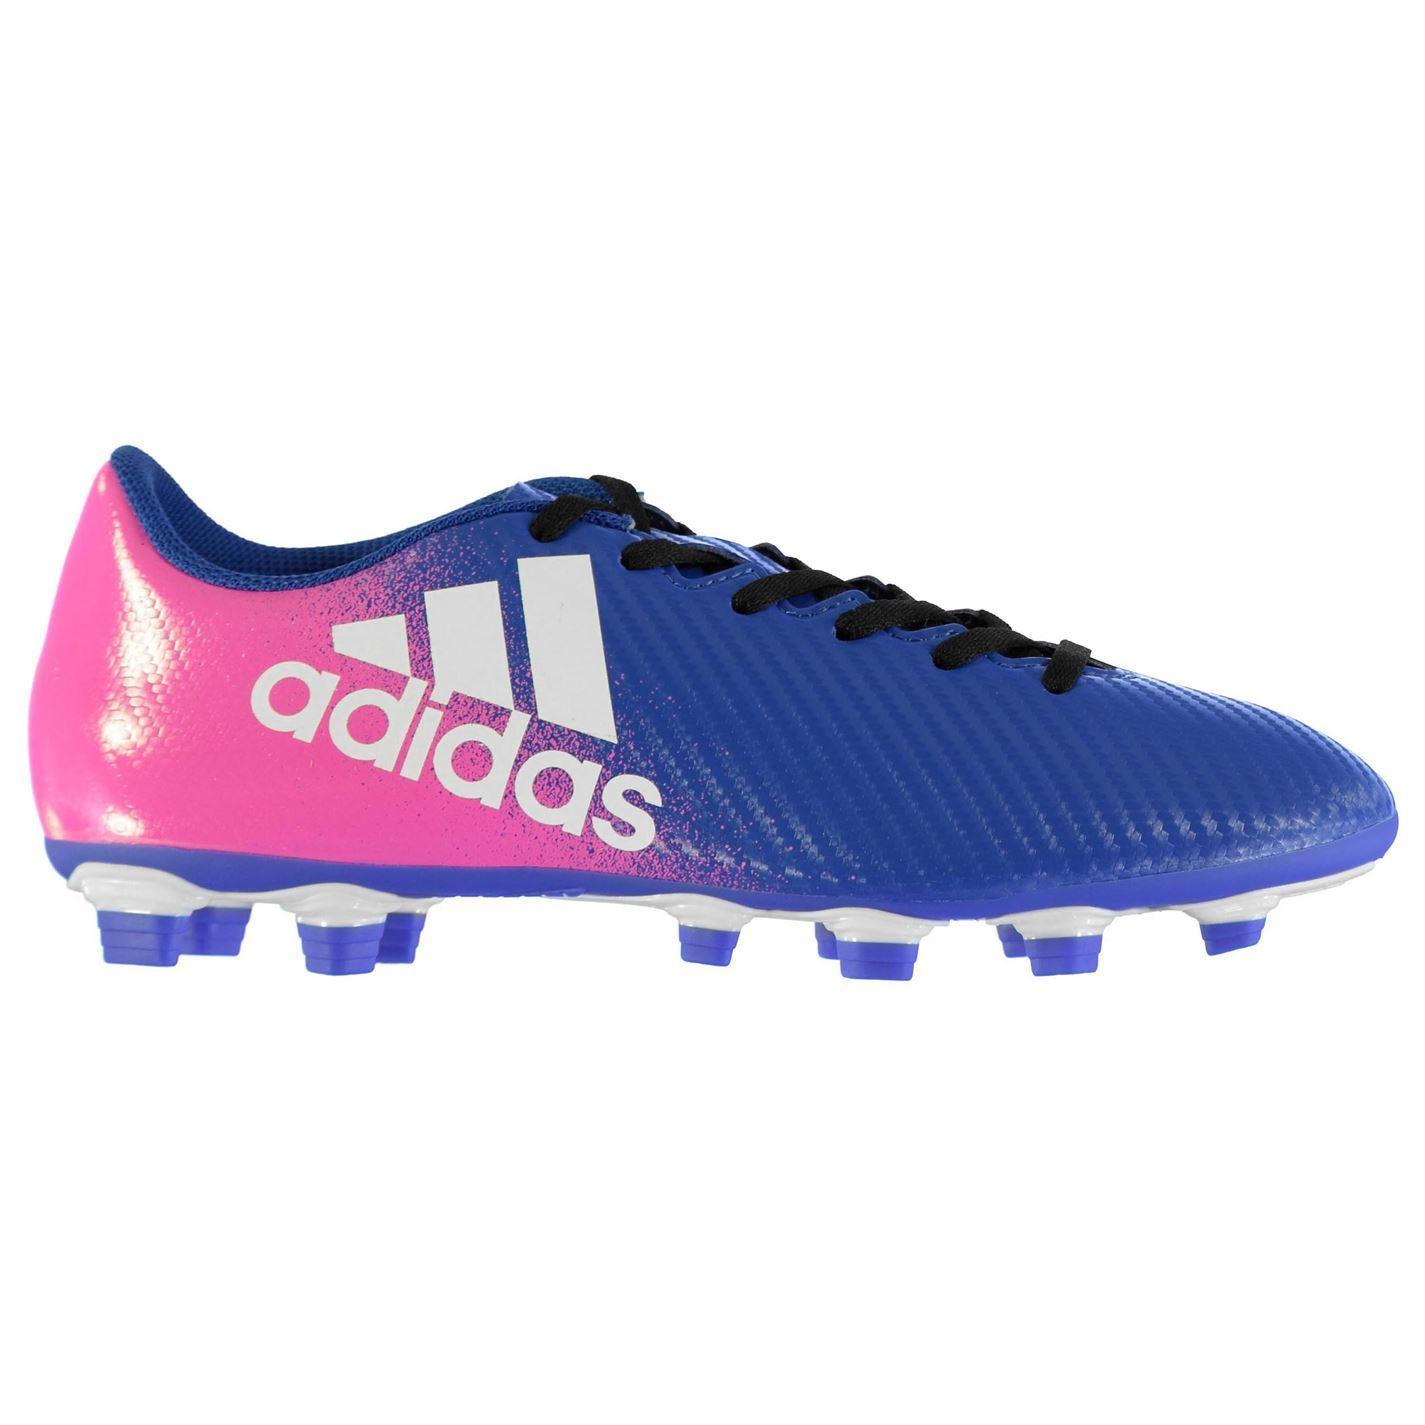 ADIDAS Uomo Scarpe Calcio Scarpe FG Firm Ground Football Boots x 16.4